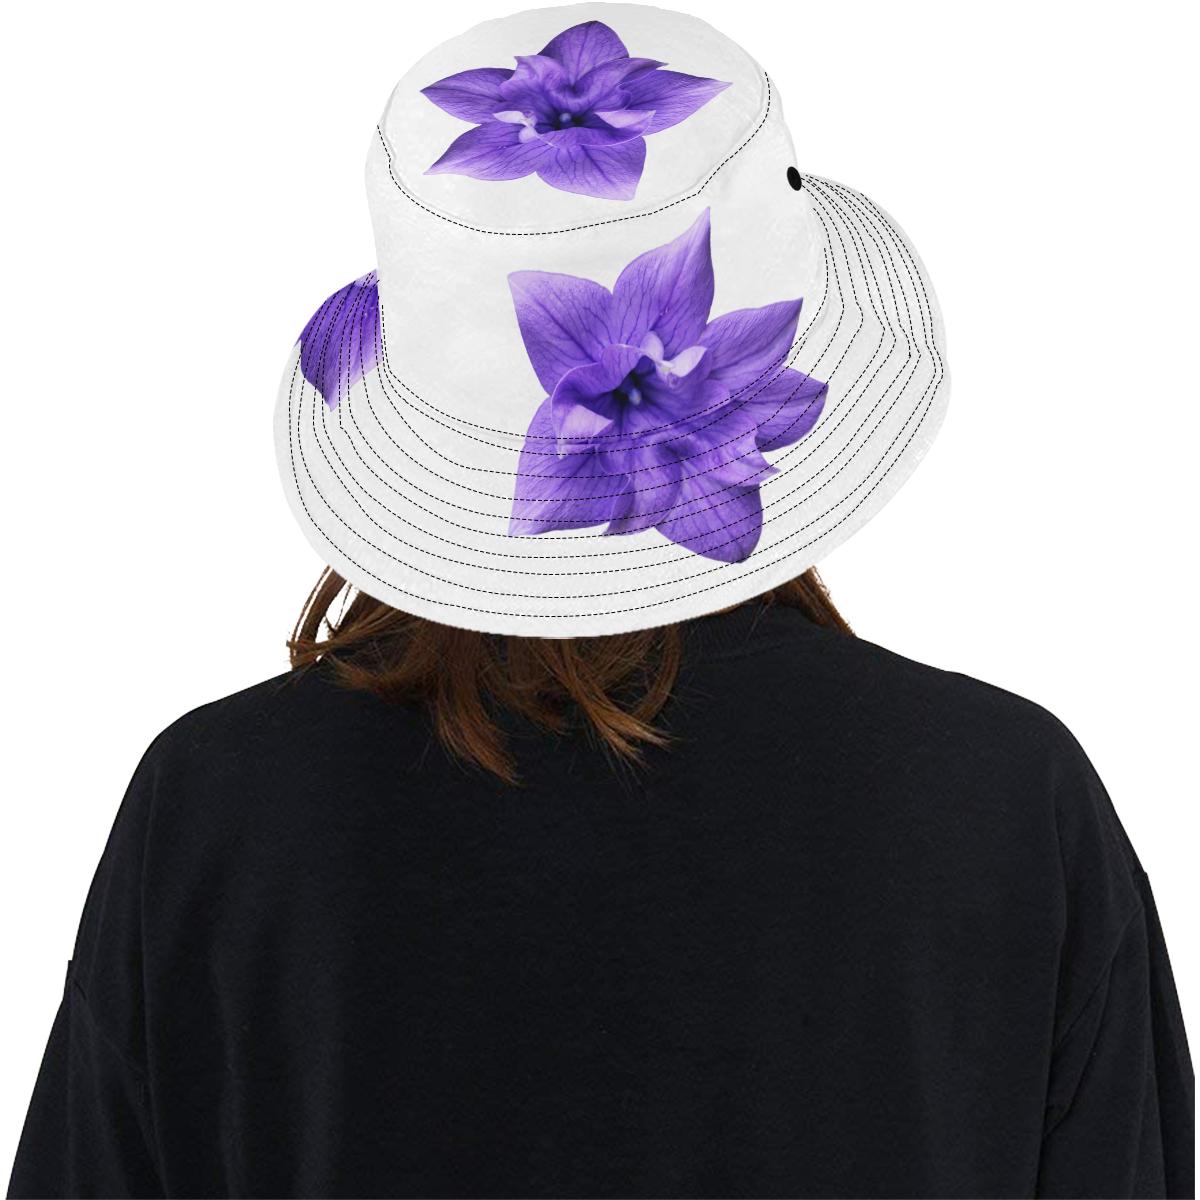 Balloon Flower All Over Print Bucket Hat